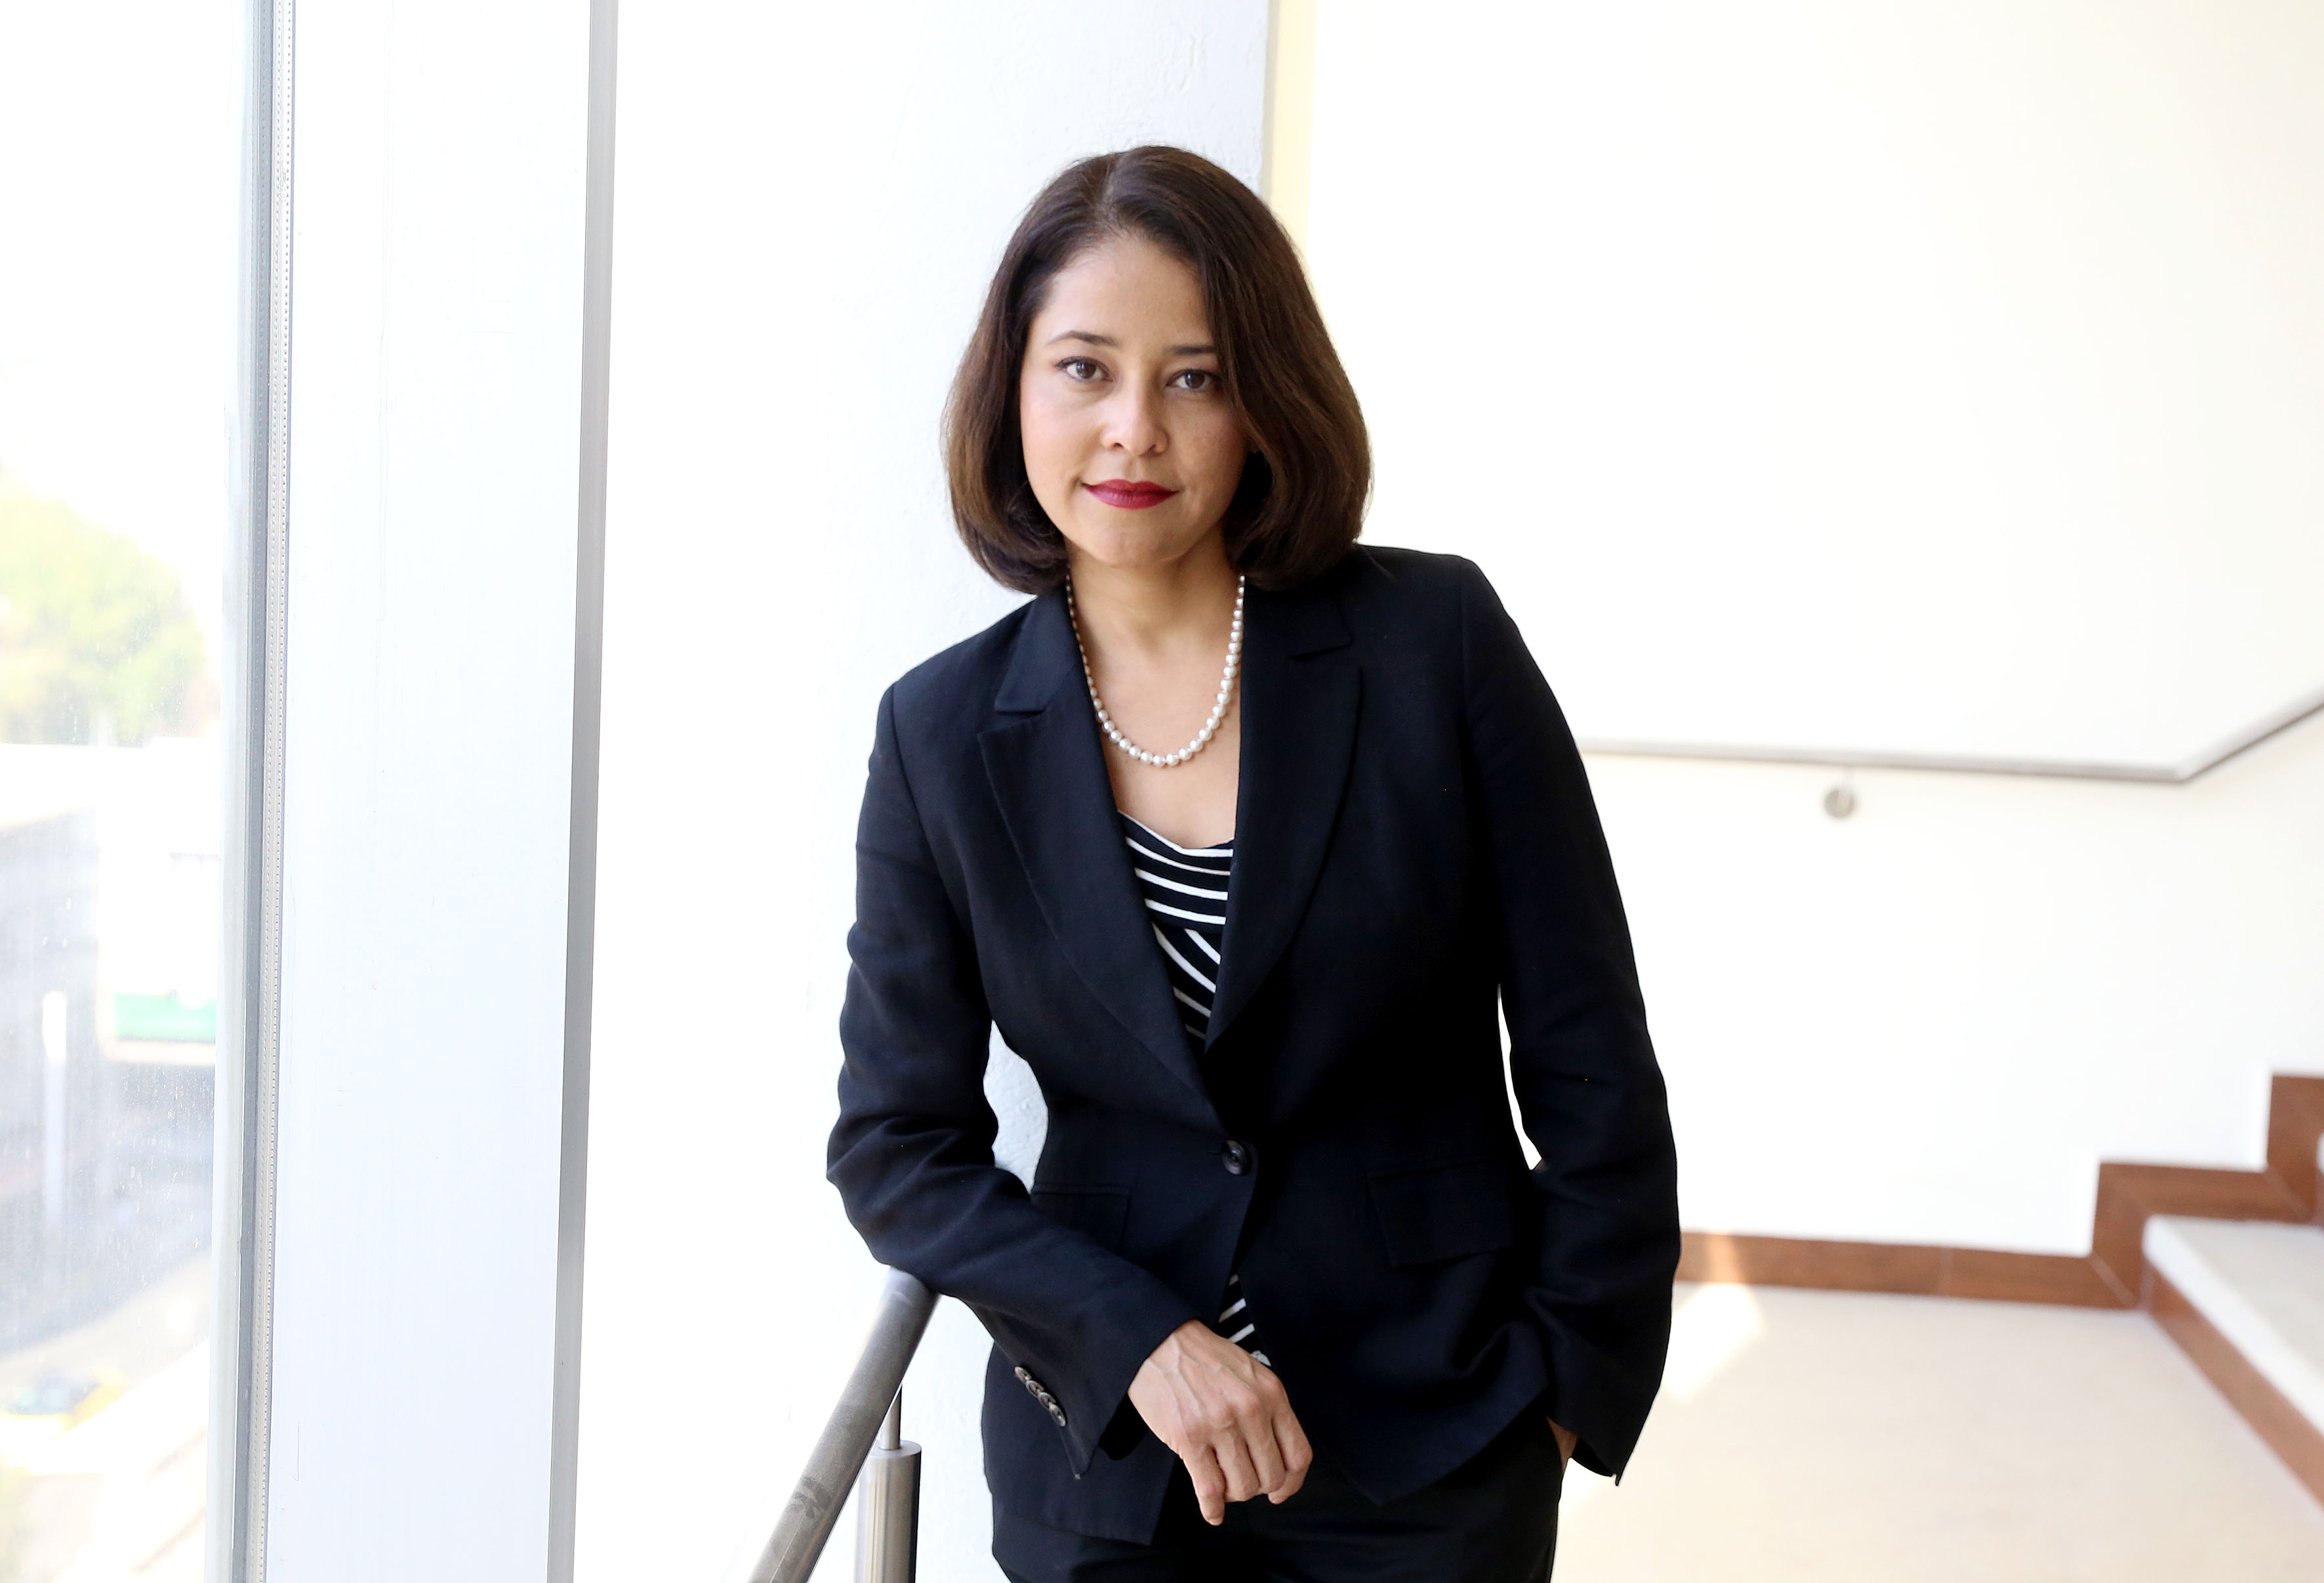 Dra.Claudia Palafox posa para la foto individual sin cubrebocas